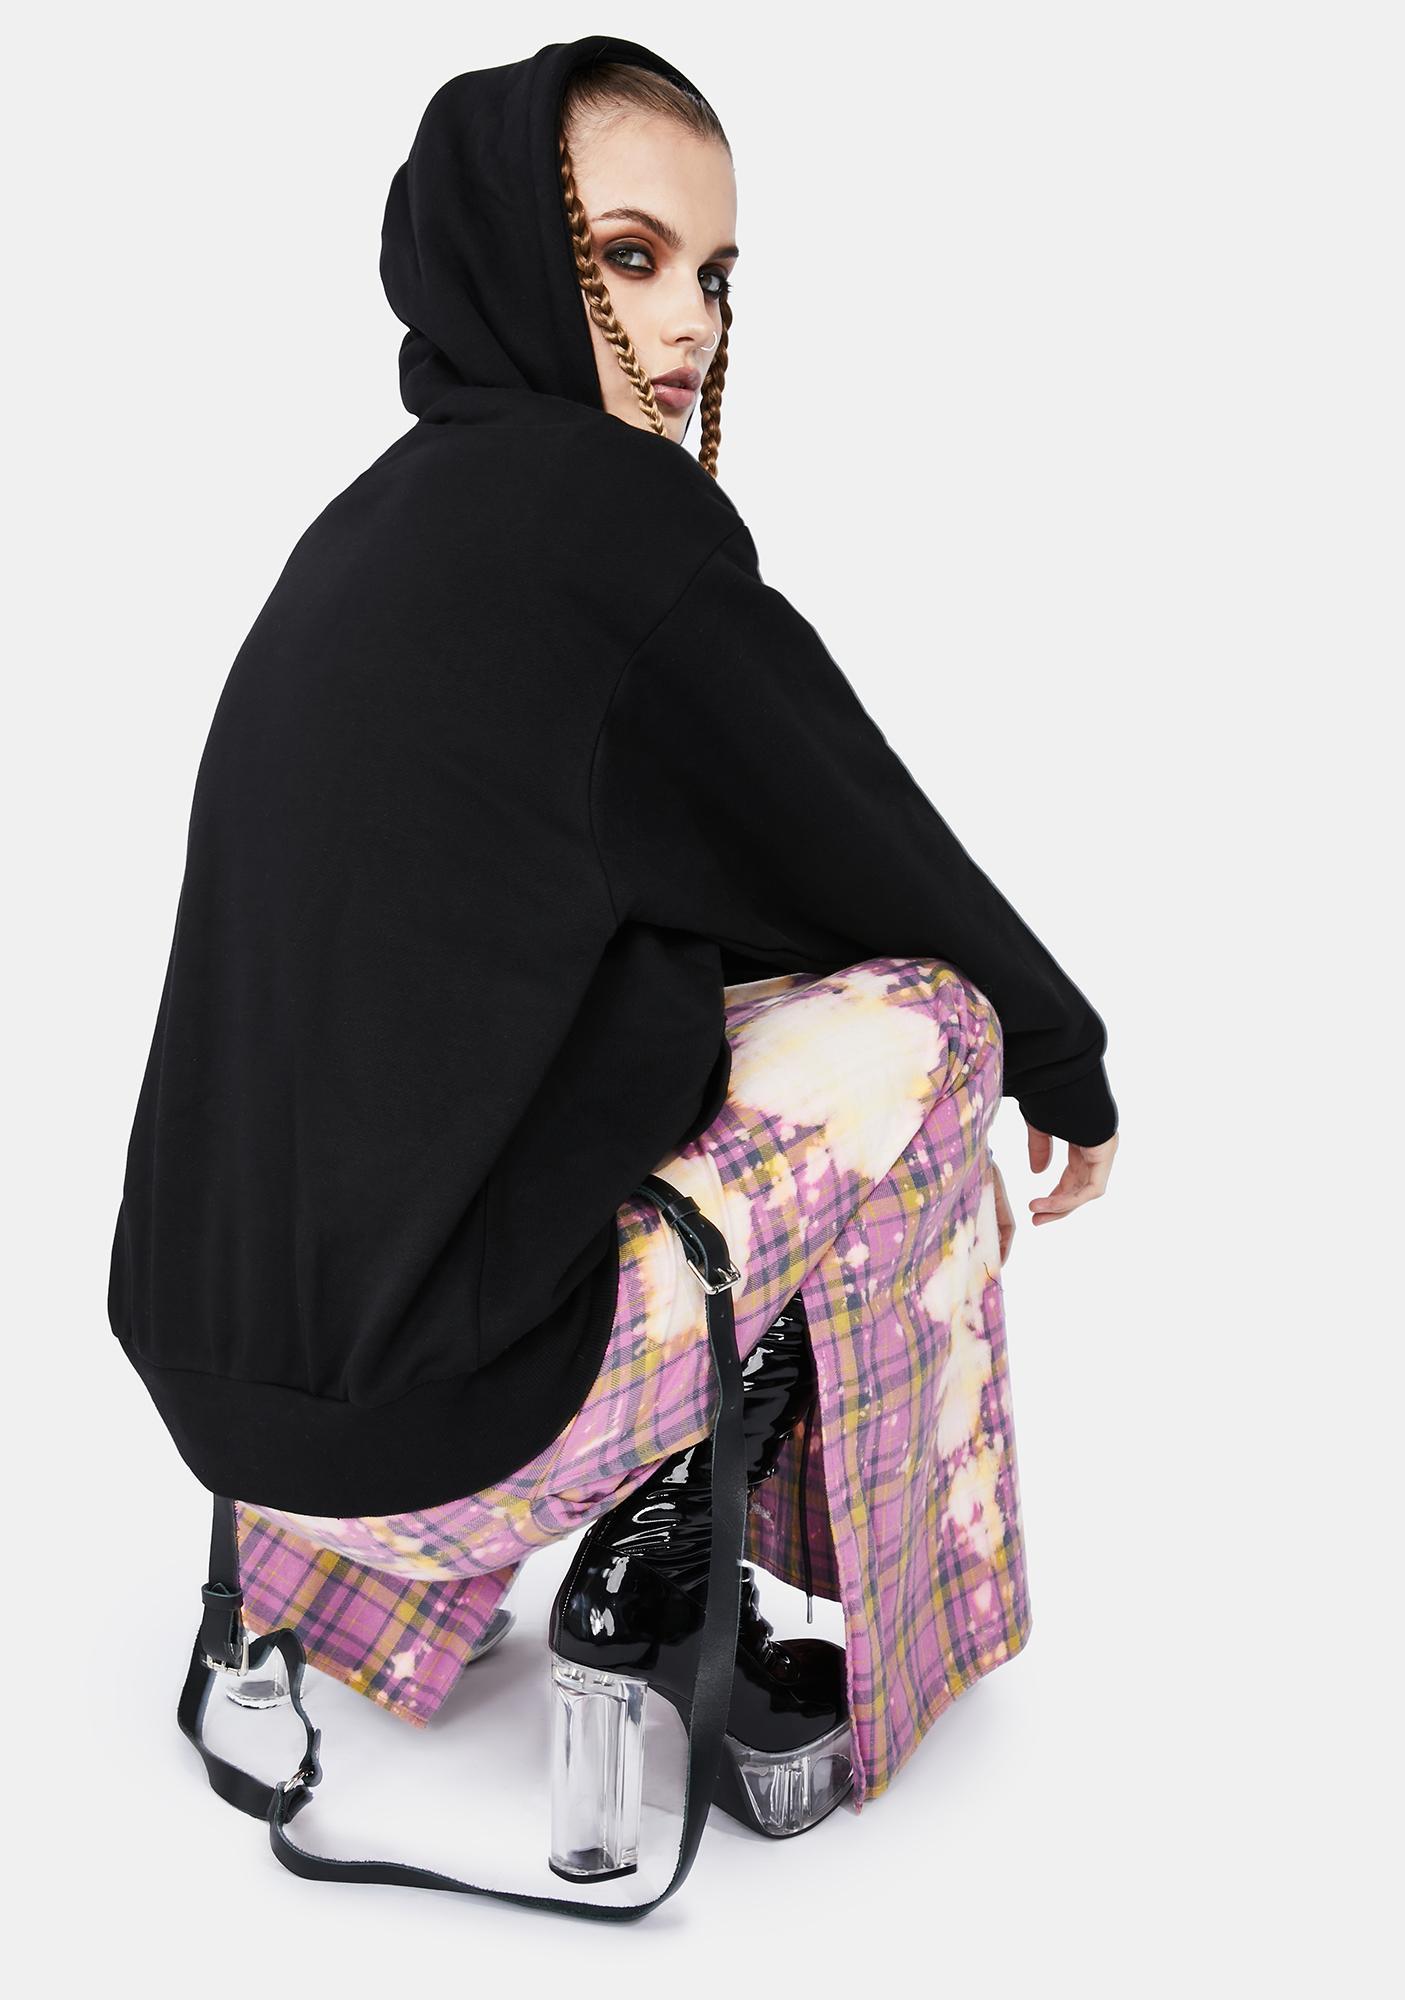 x-Girl X Hysteric Glamour Hoodie Sweatshirt